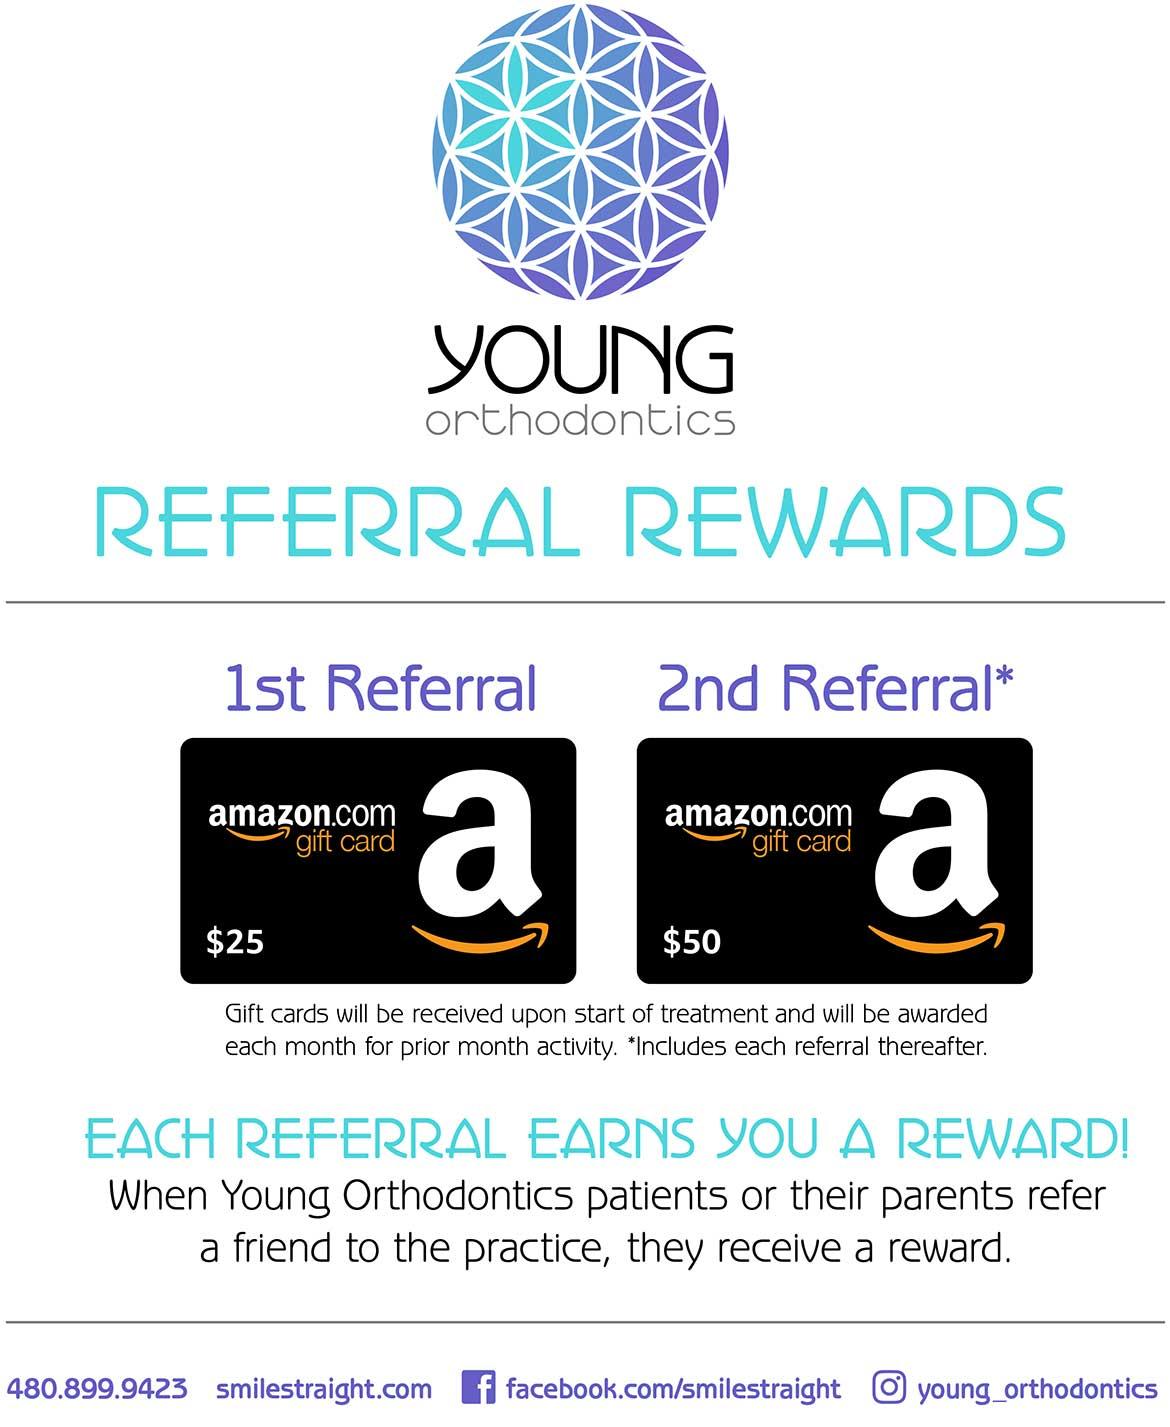 Young Orthodontics Referral Rewards